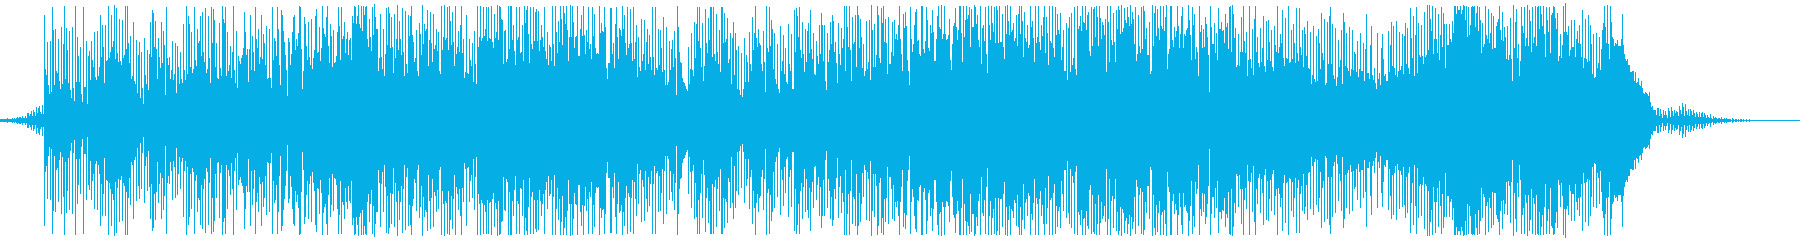 shab◎nのクリスマスソングの再生済みの波形